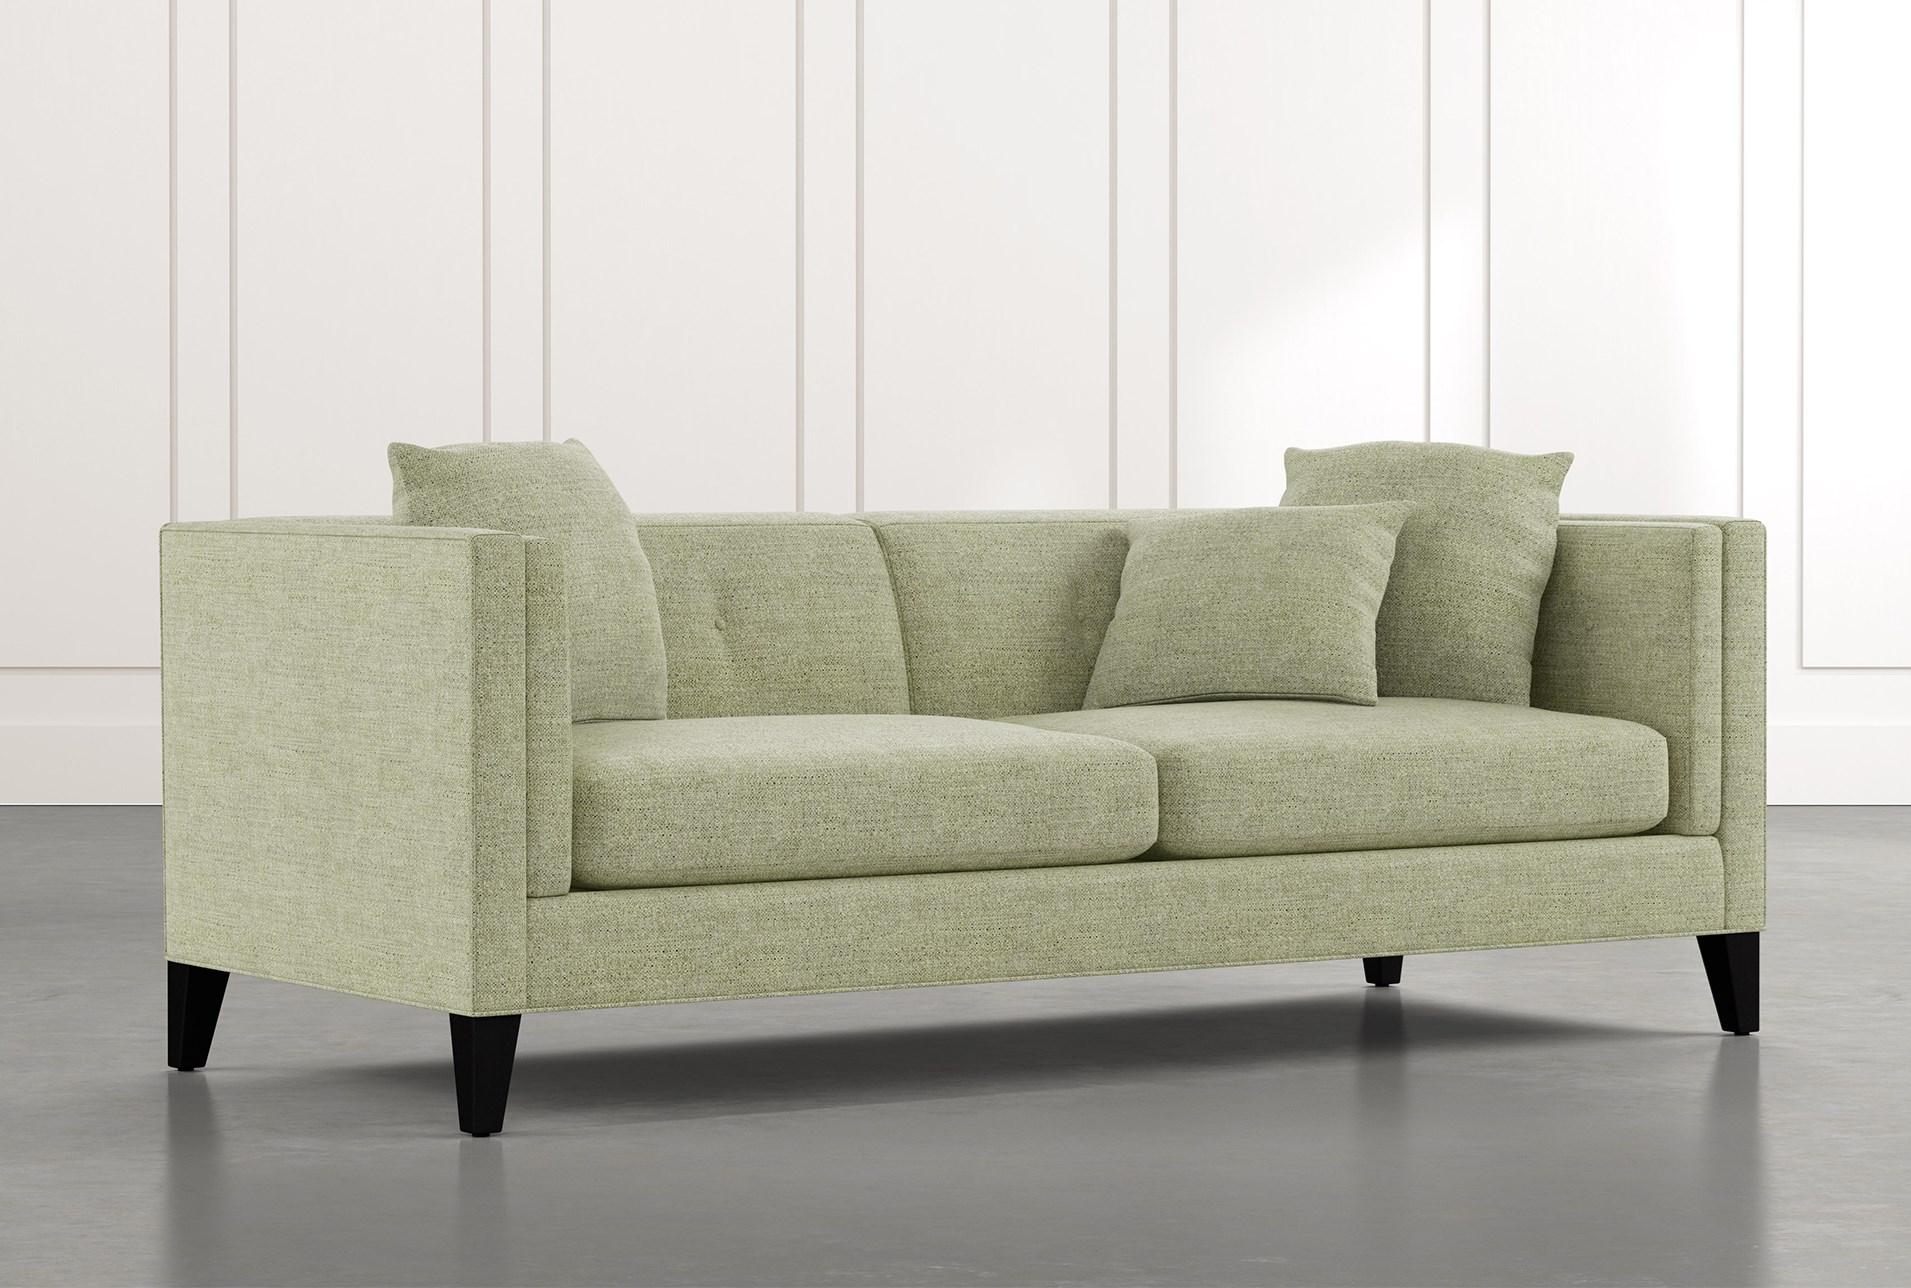 Avery II Green Sofa